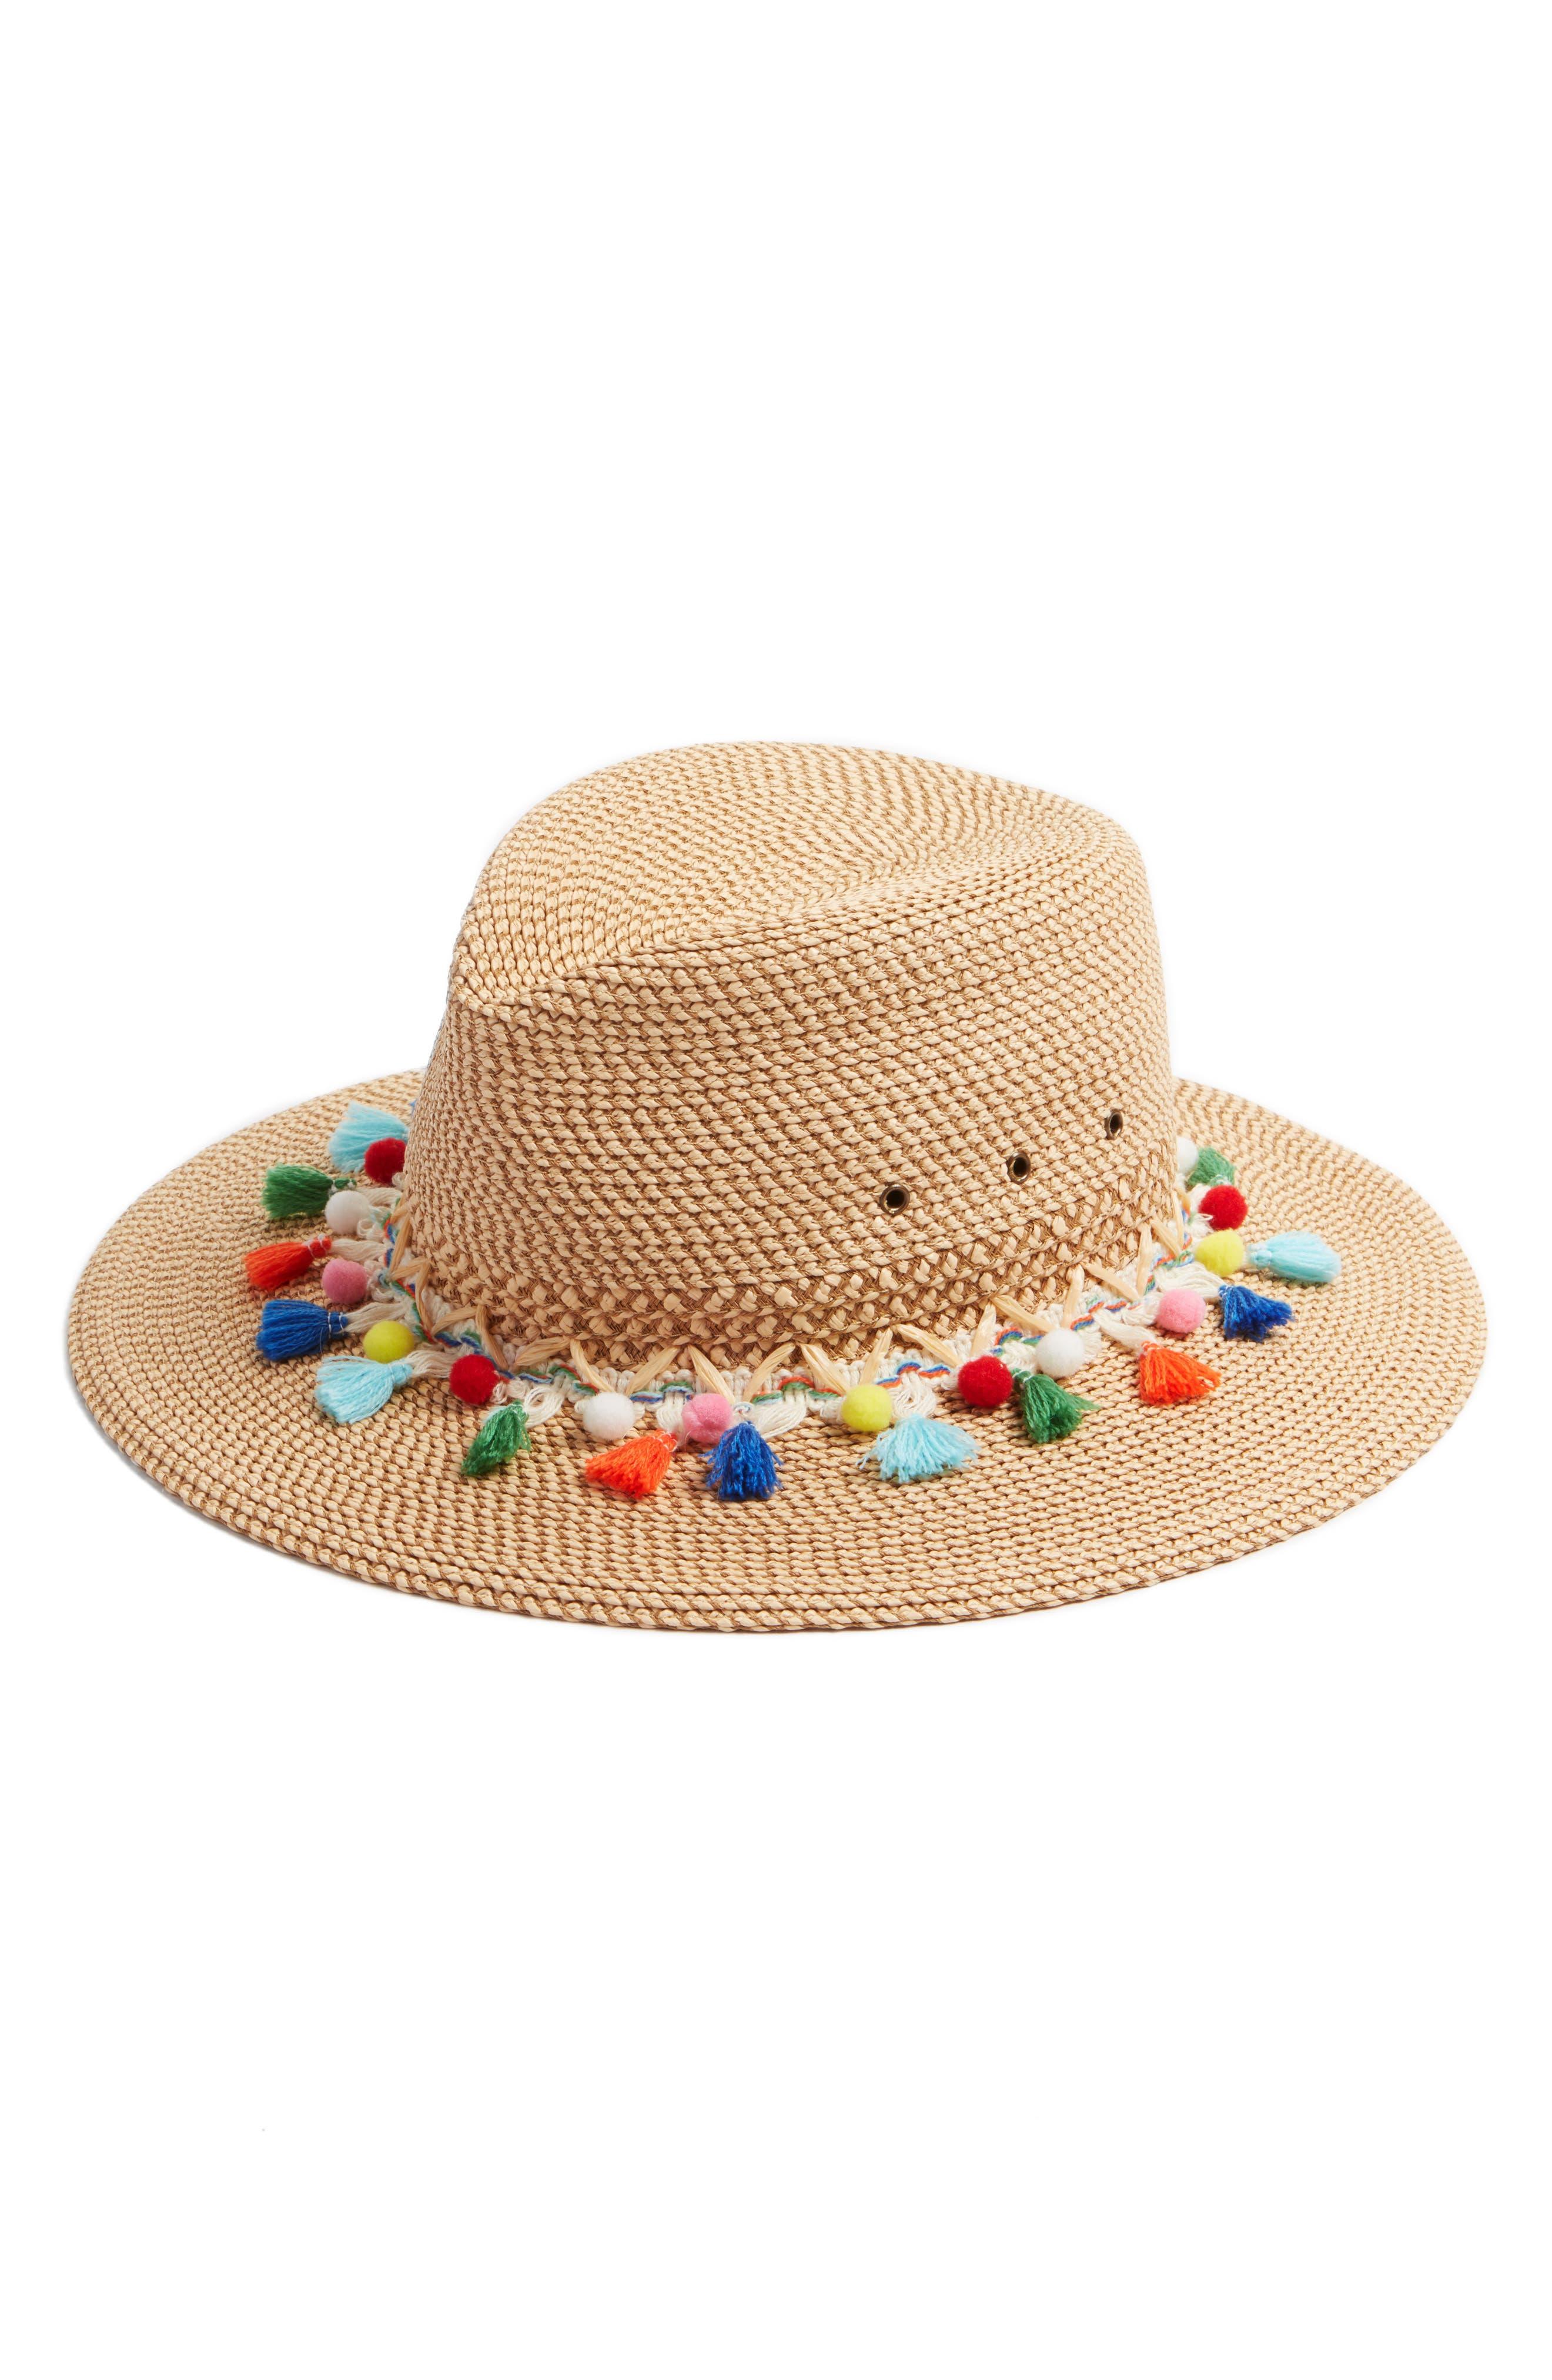 Bahia Sun Hat,                         Main,                         color, Peanut Mix